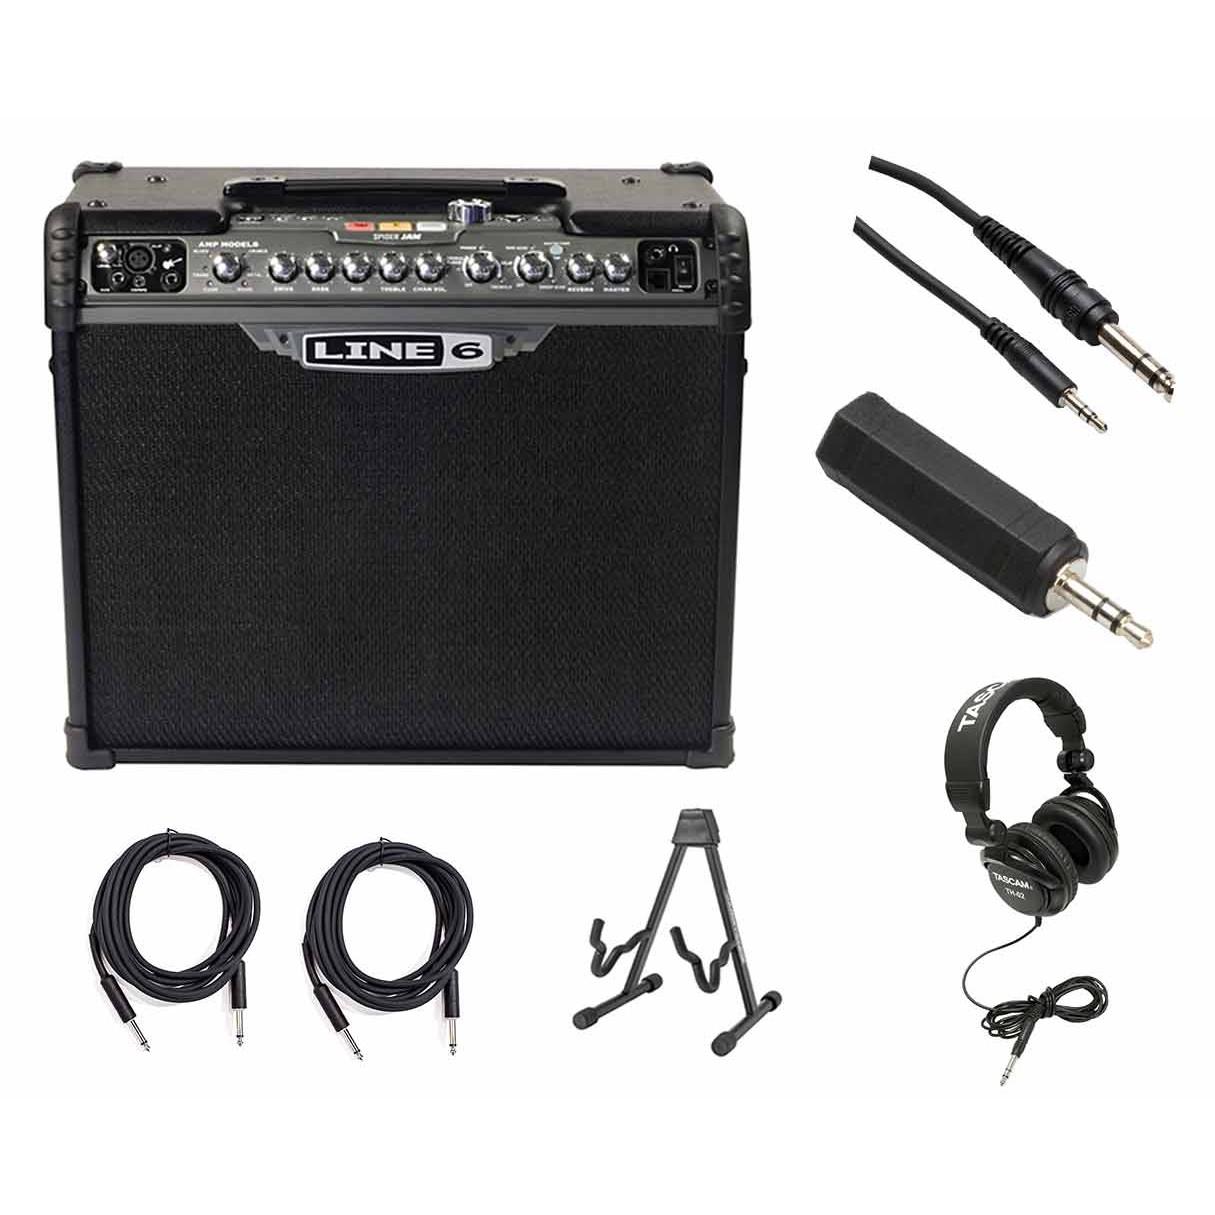 Line 6 Spider JAM 75 Watt Guitar 1X12 Combo Amp Bonus Bundle